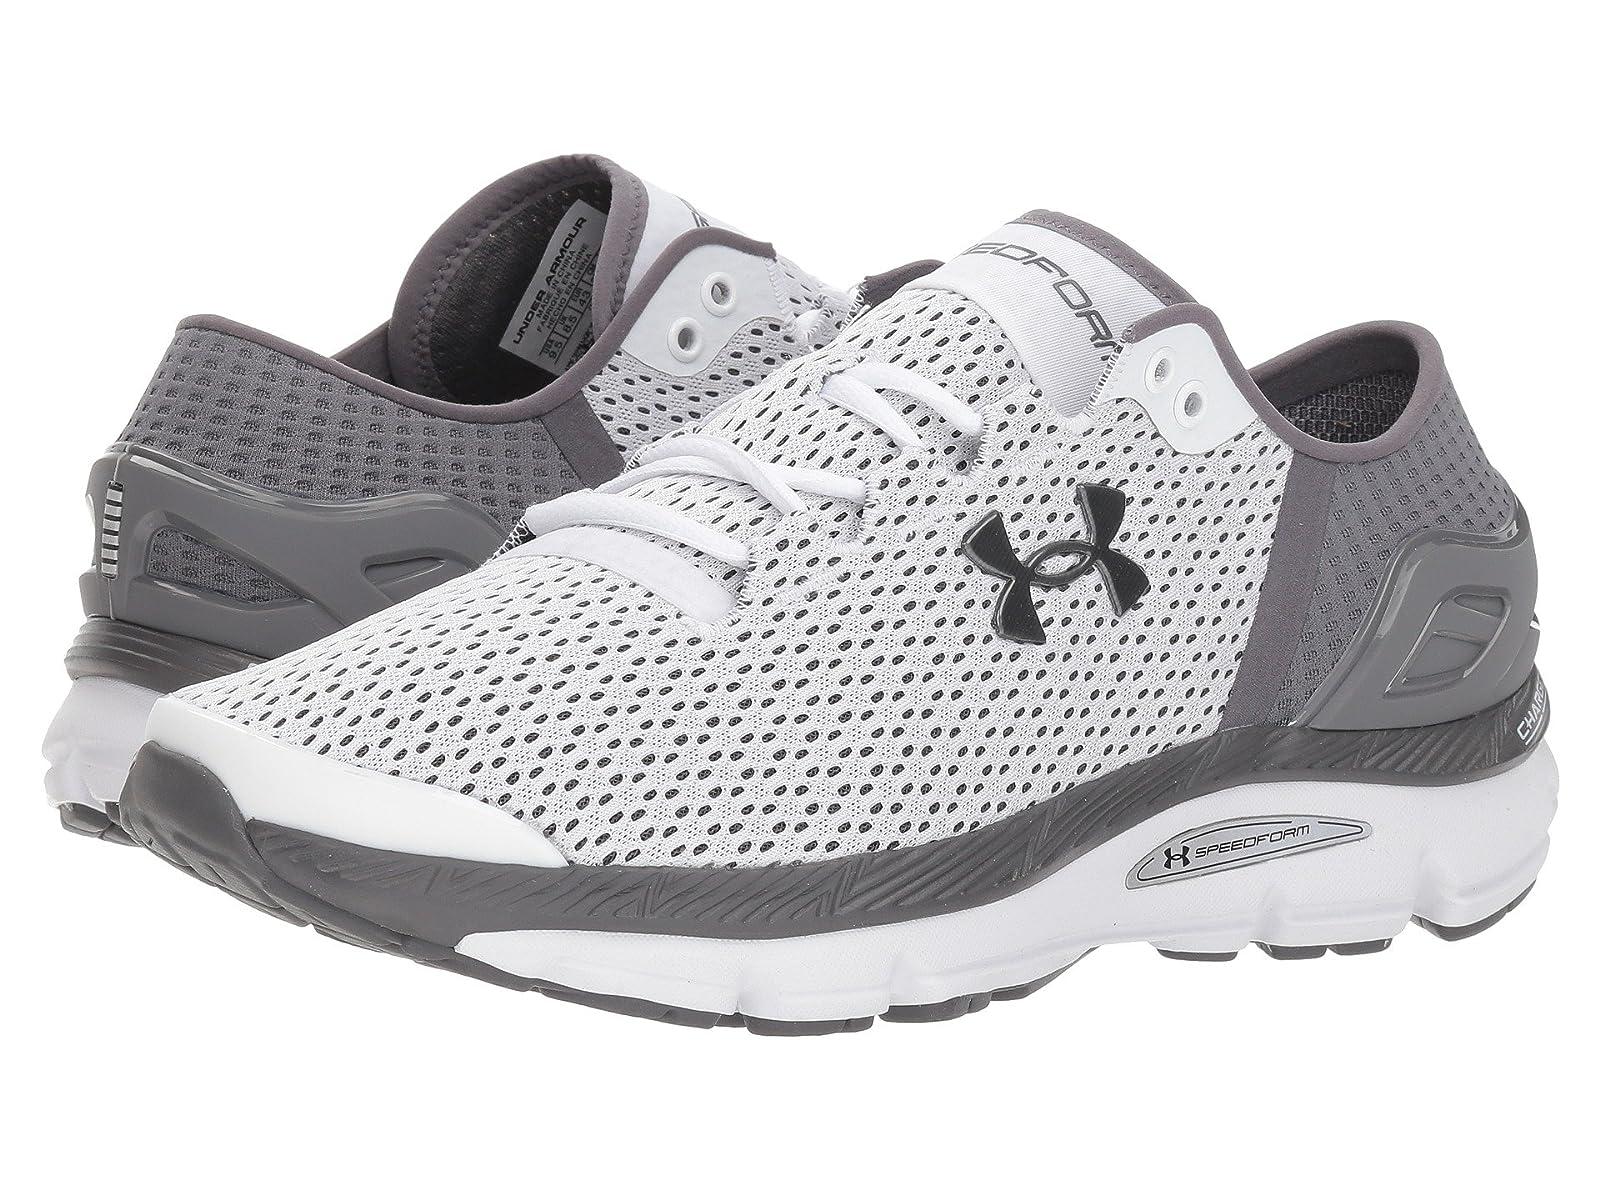 Under Armour UA Speedform Intake 2Atmospheric grades have affordable shoes